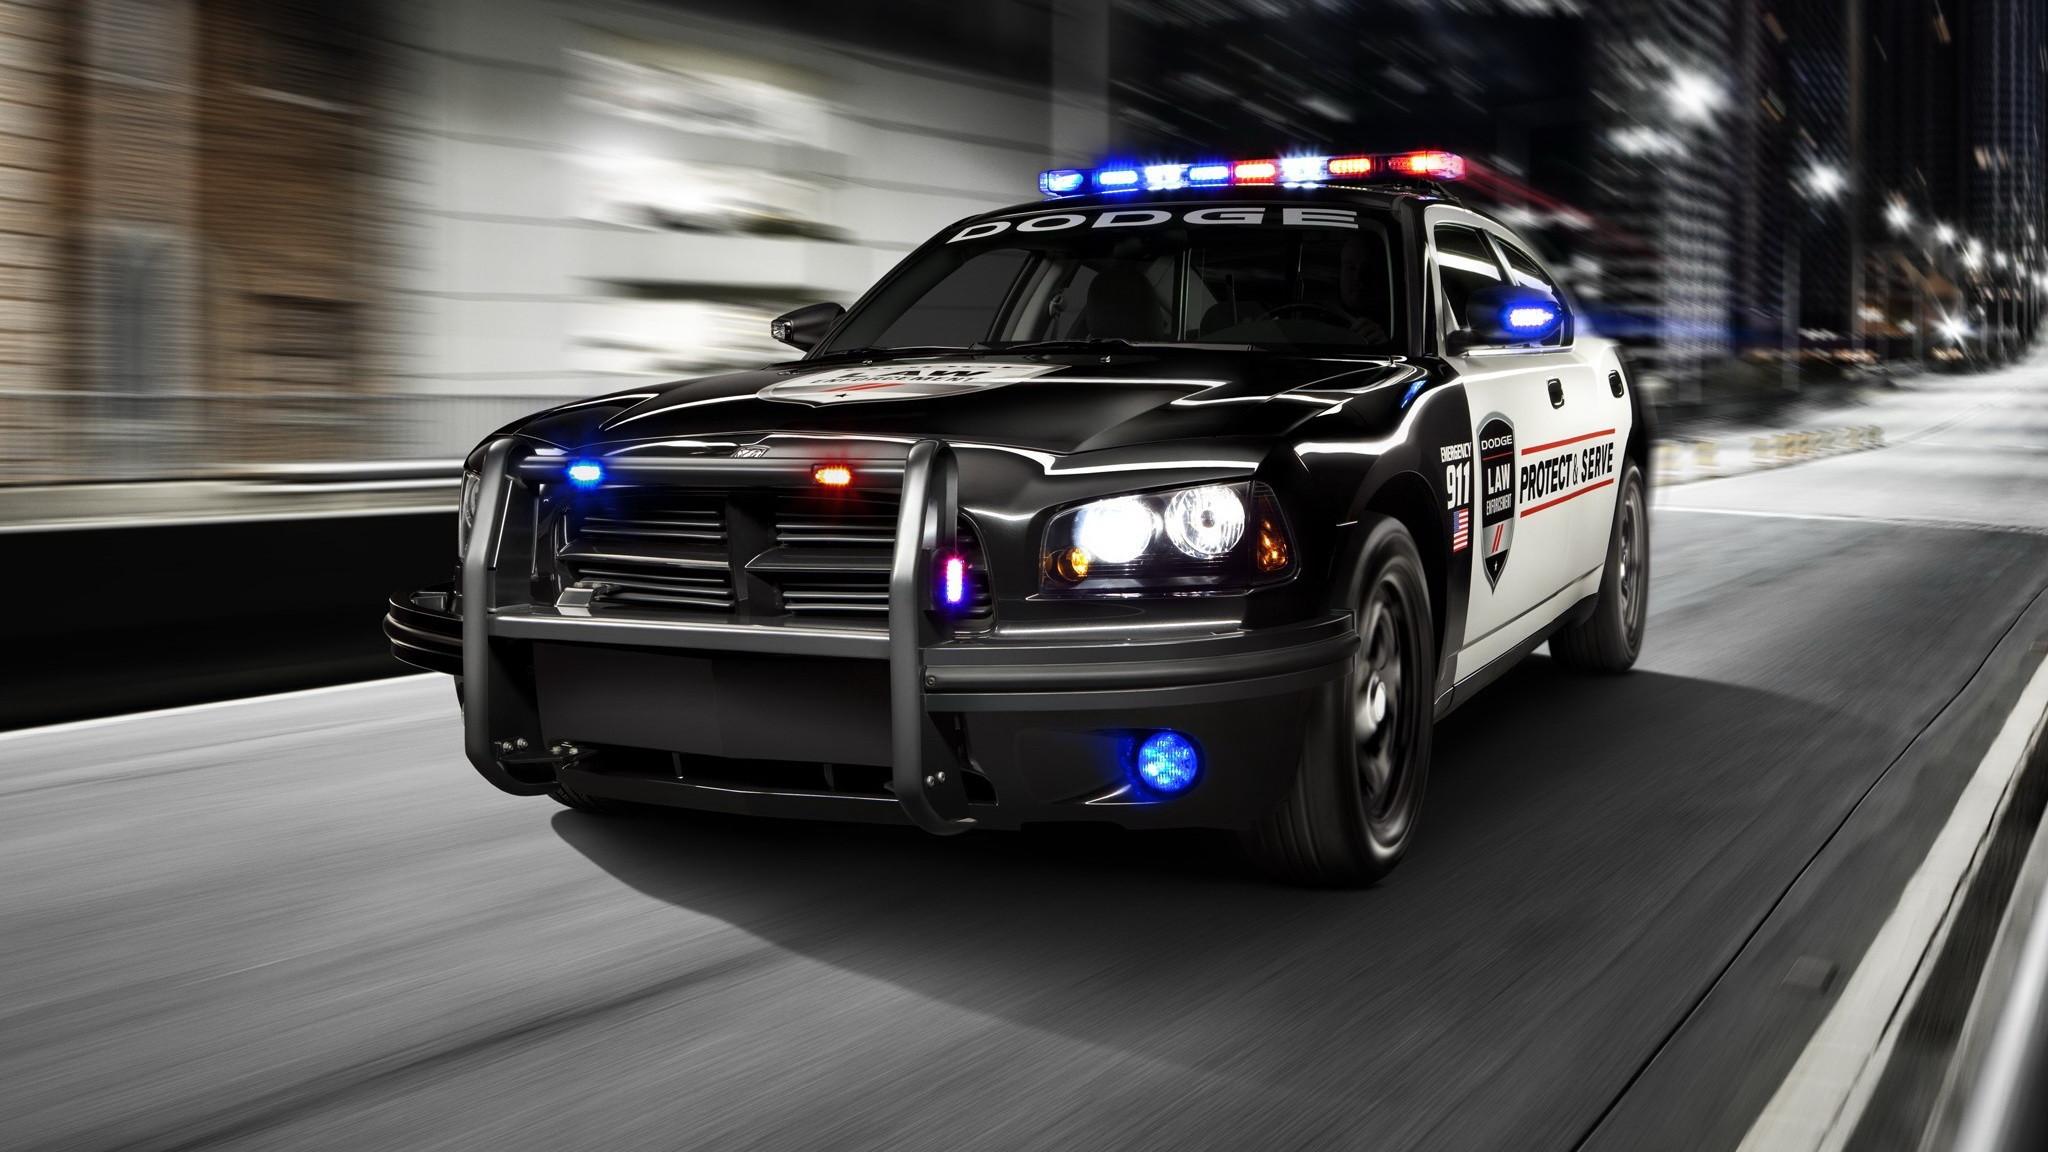 Police Car Background …